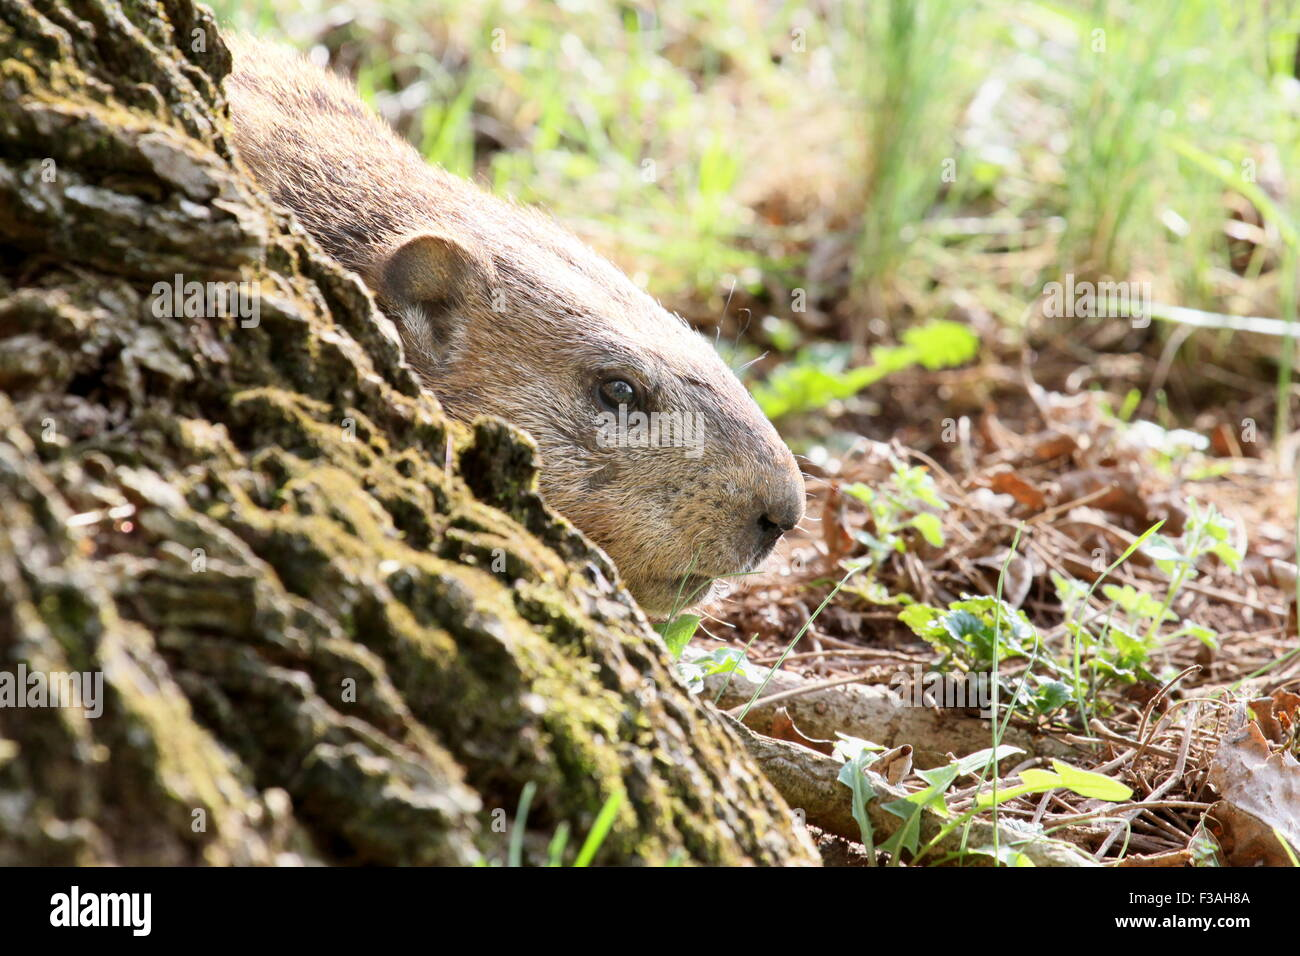 Groundhog peeking around a tree trunk. - Stock Image